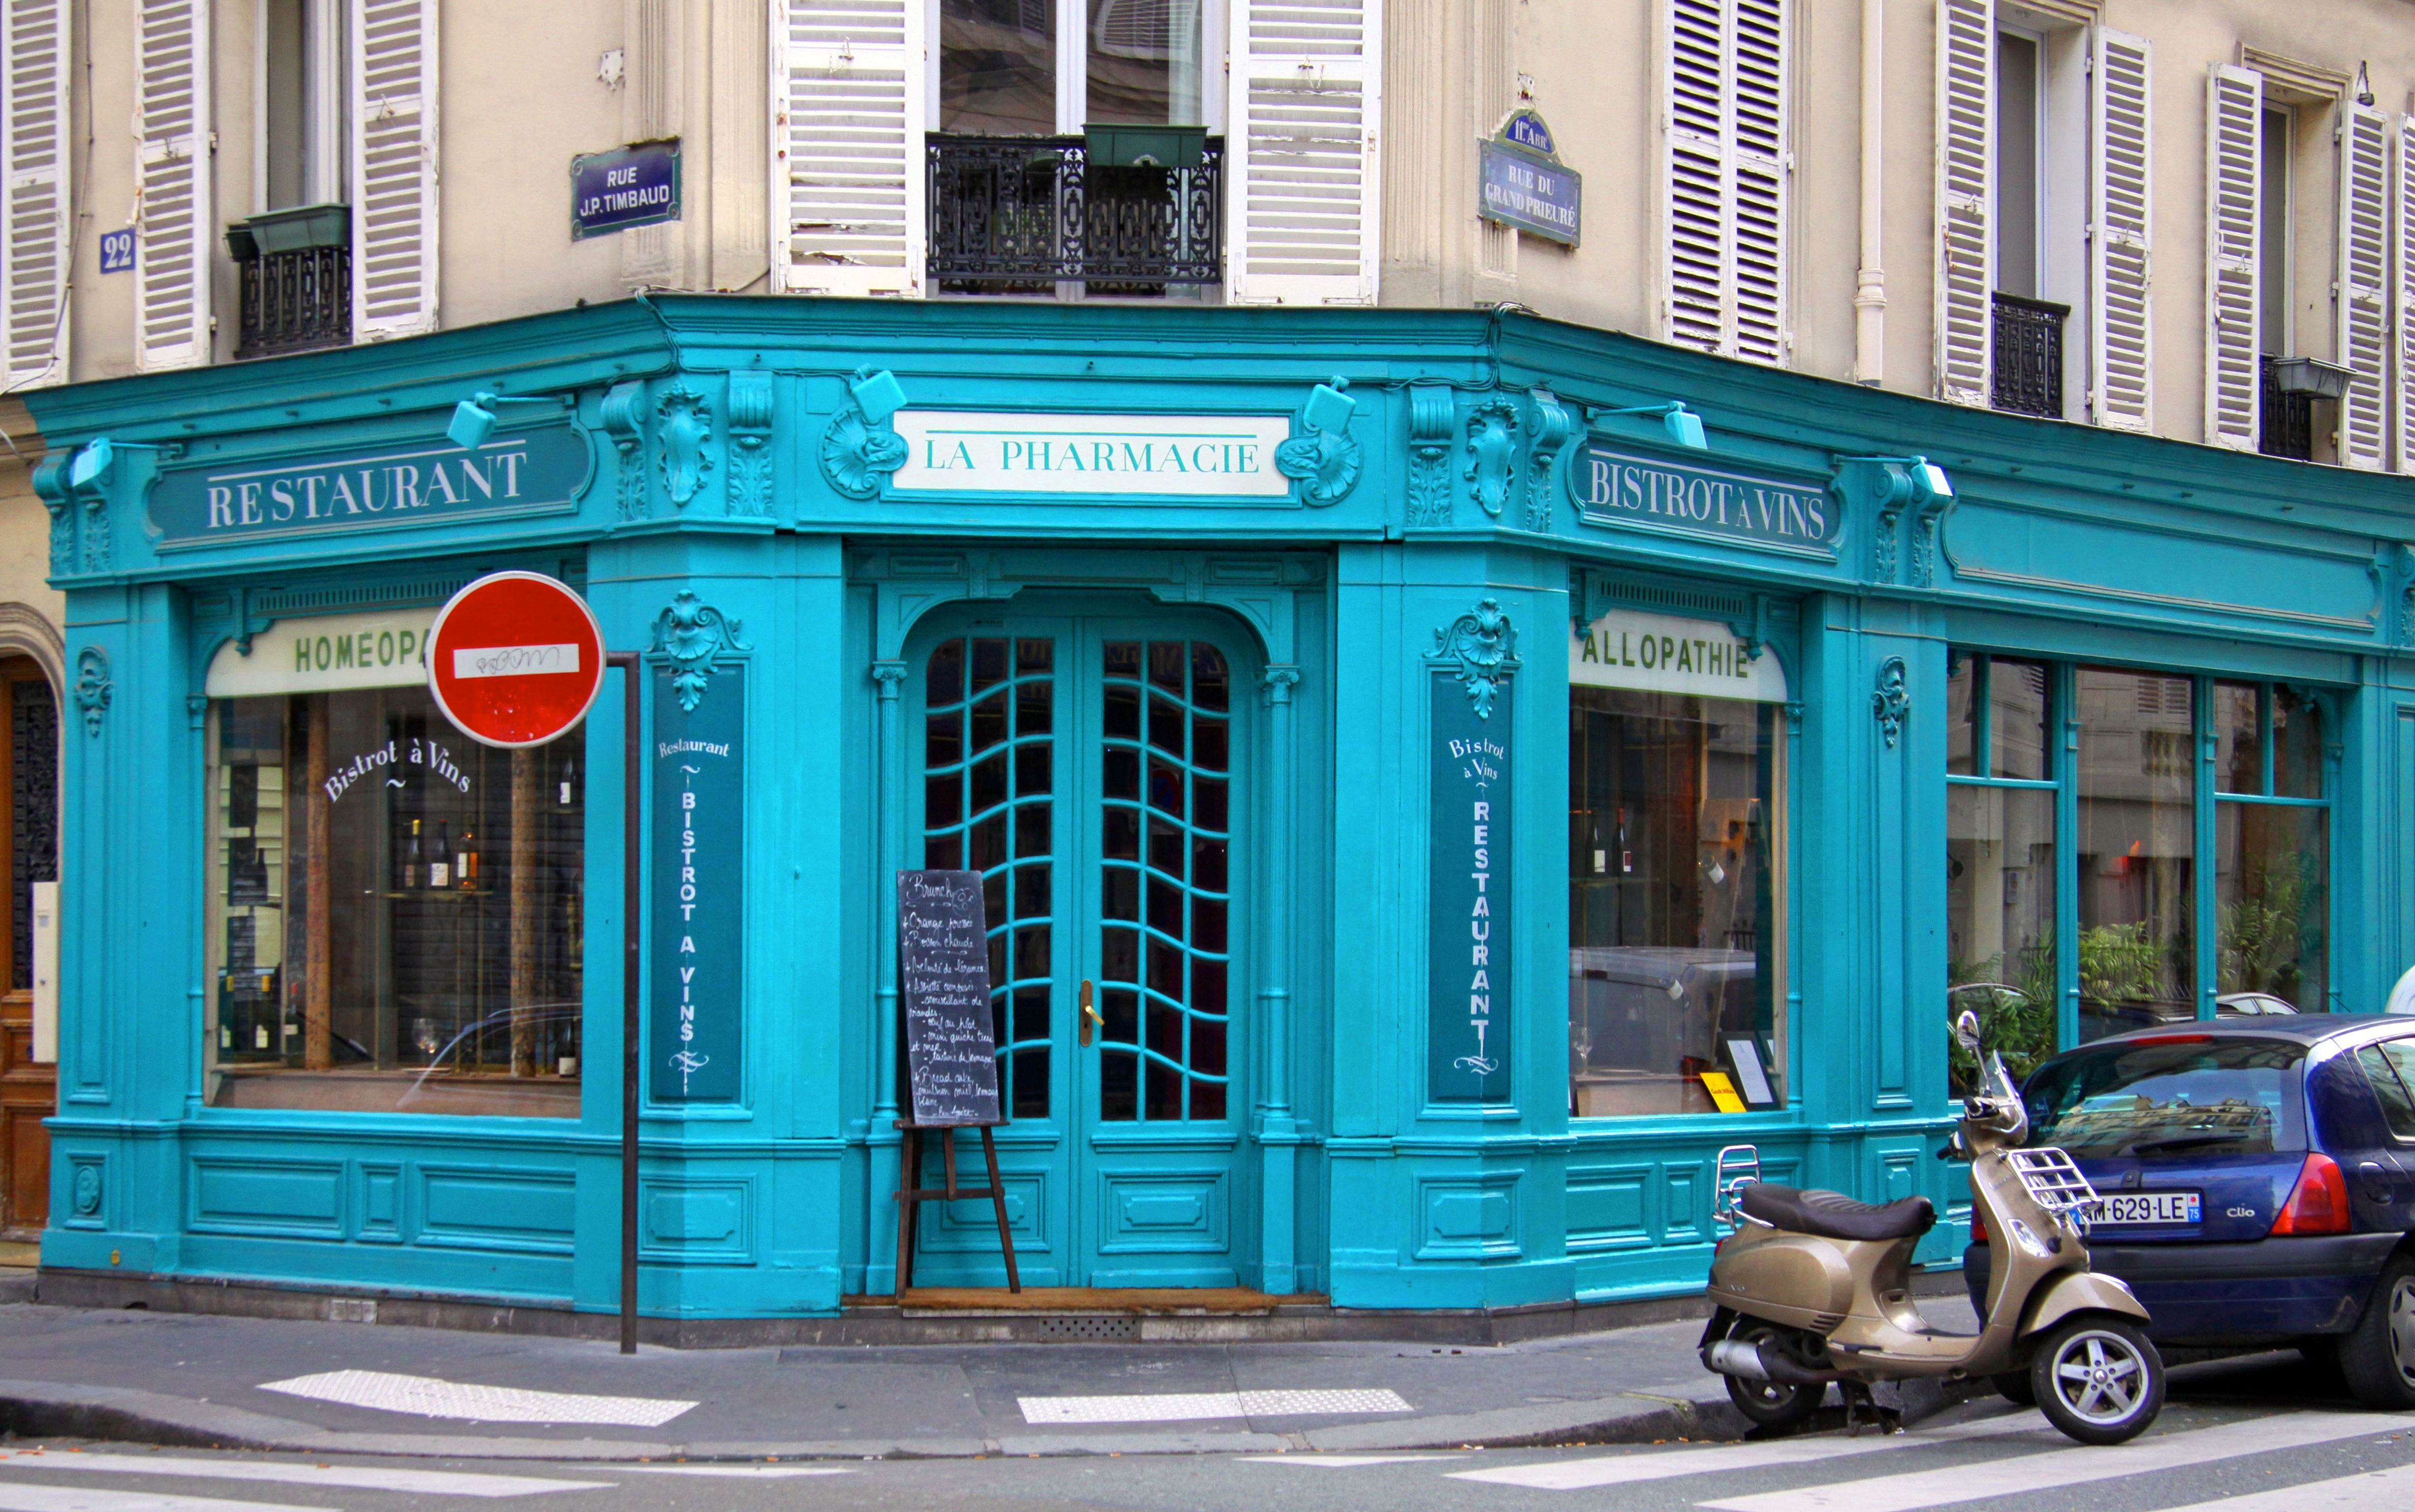 La Pharmacie Paris Restaurant